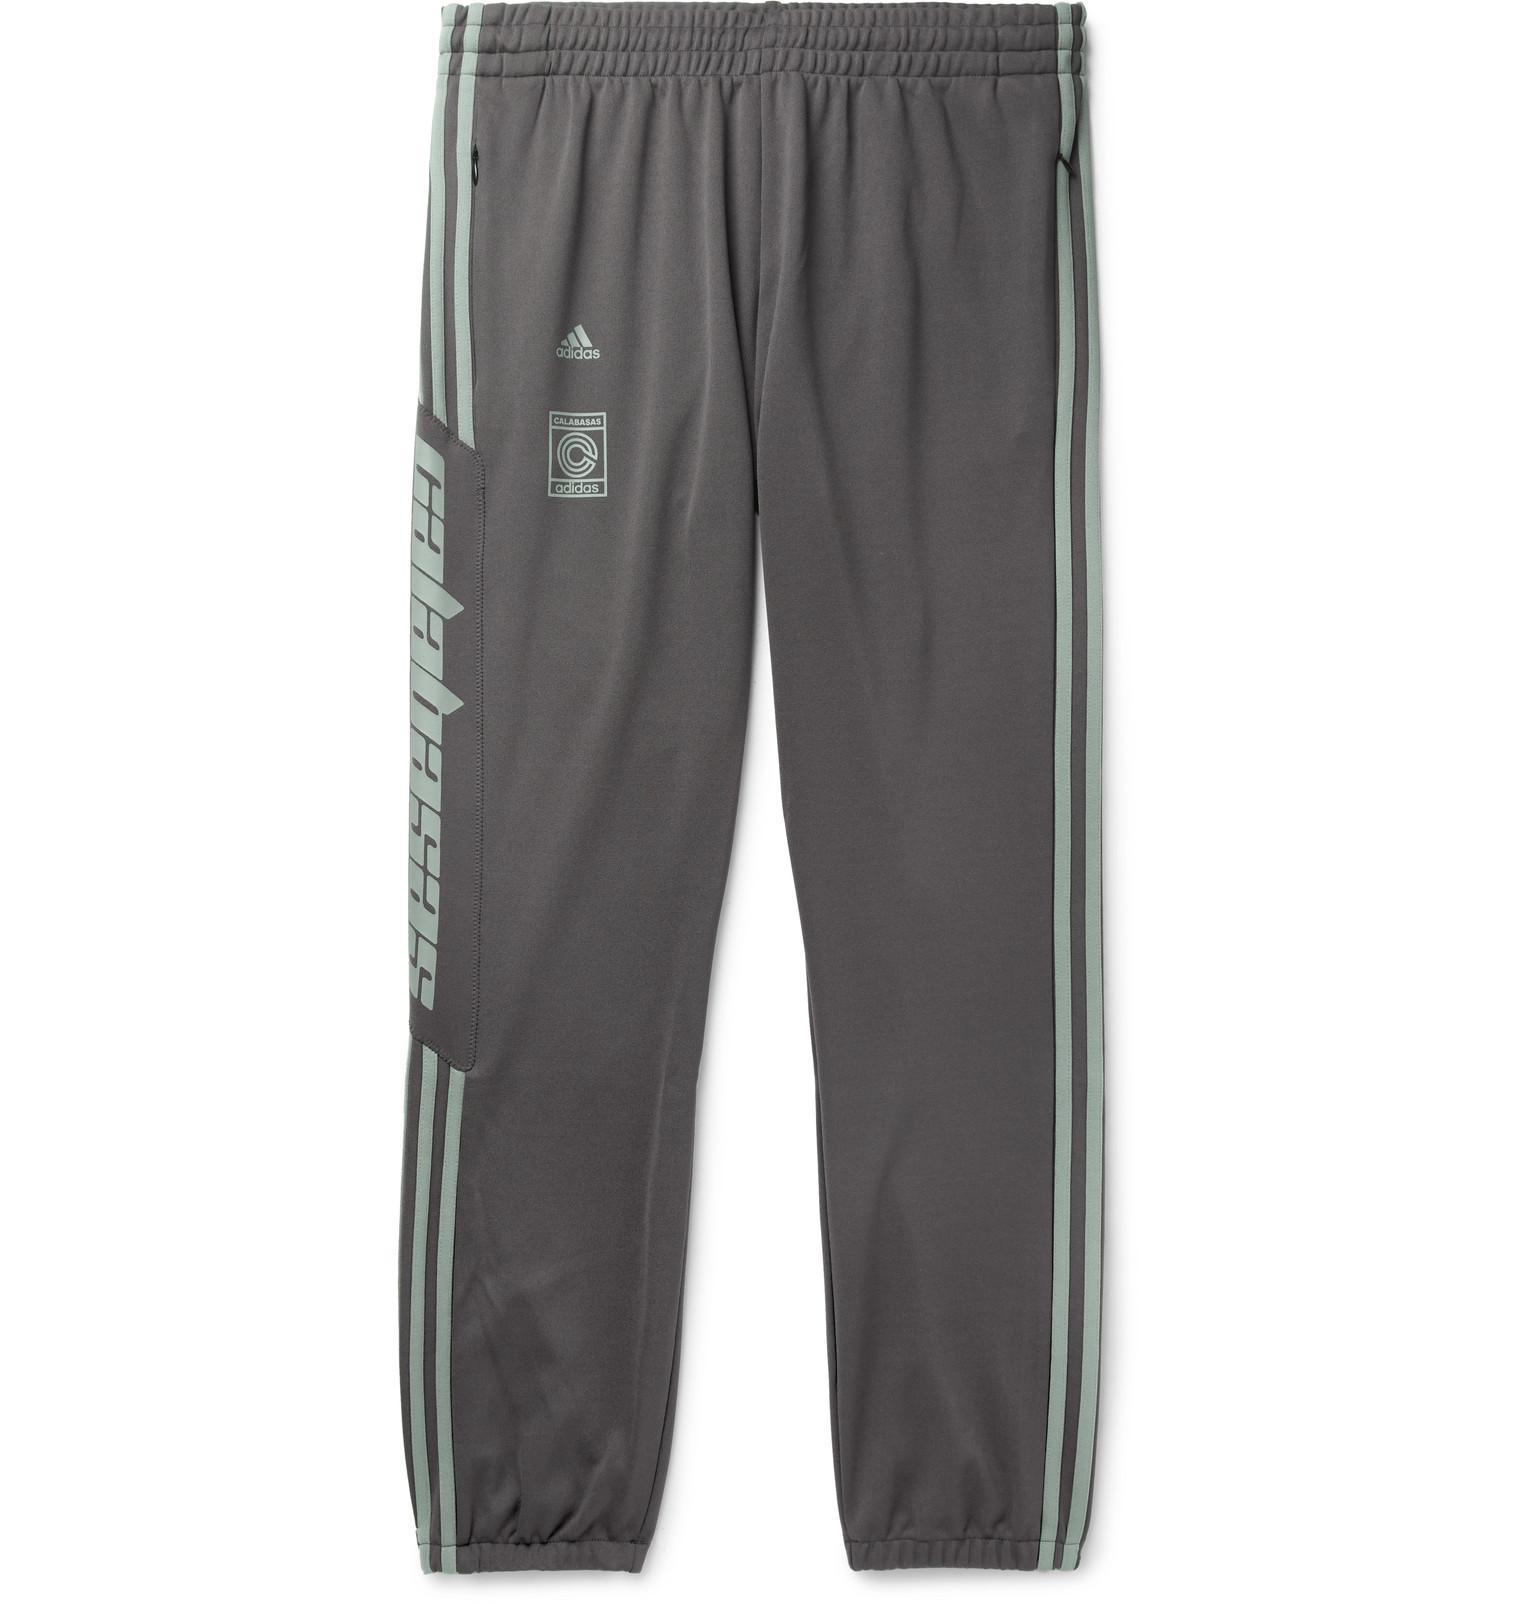 3e32f3e7f3767 adidas Originals + Yeezy Calabasas Slim-fit Tapered Jersey ...